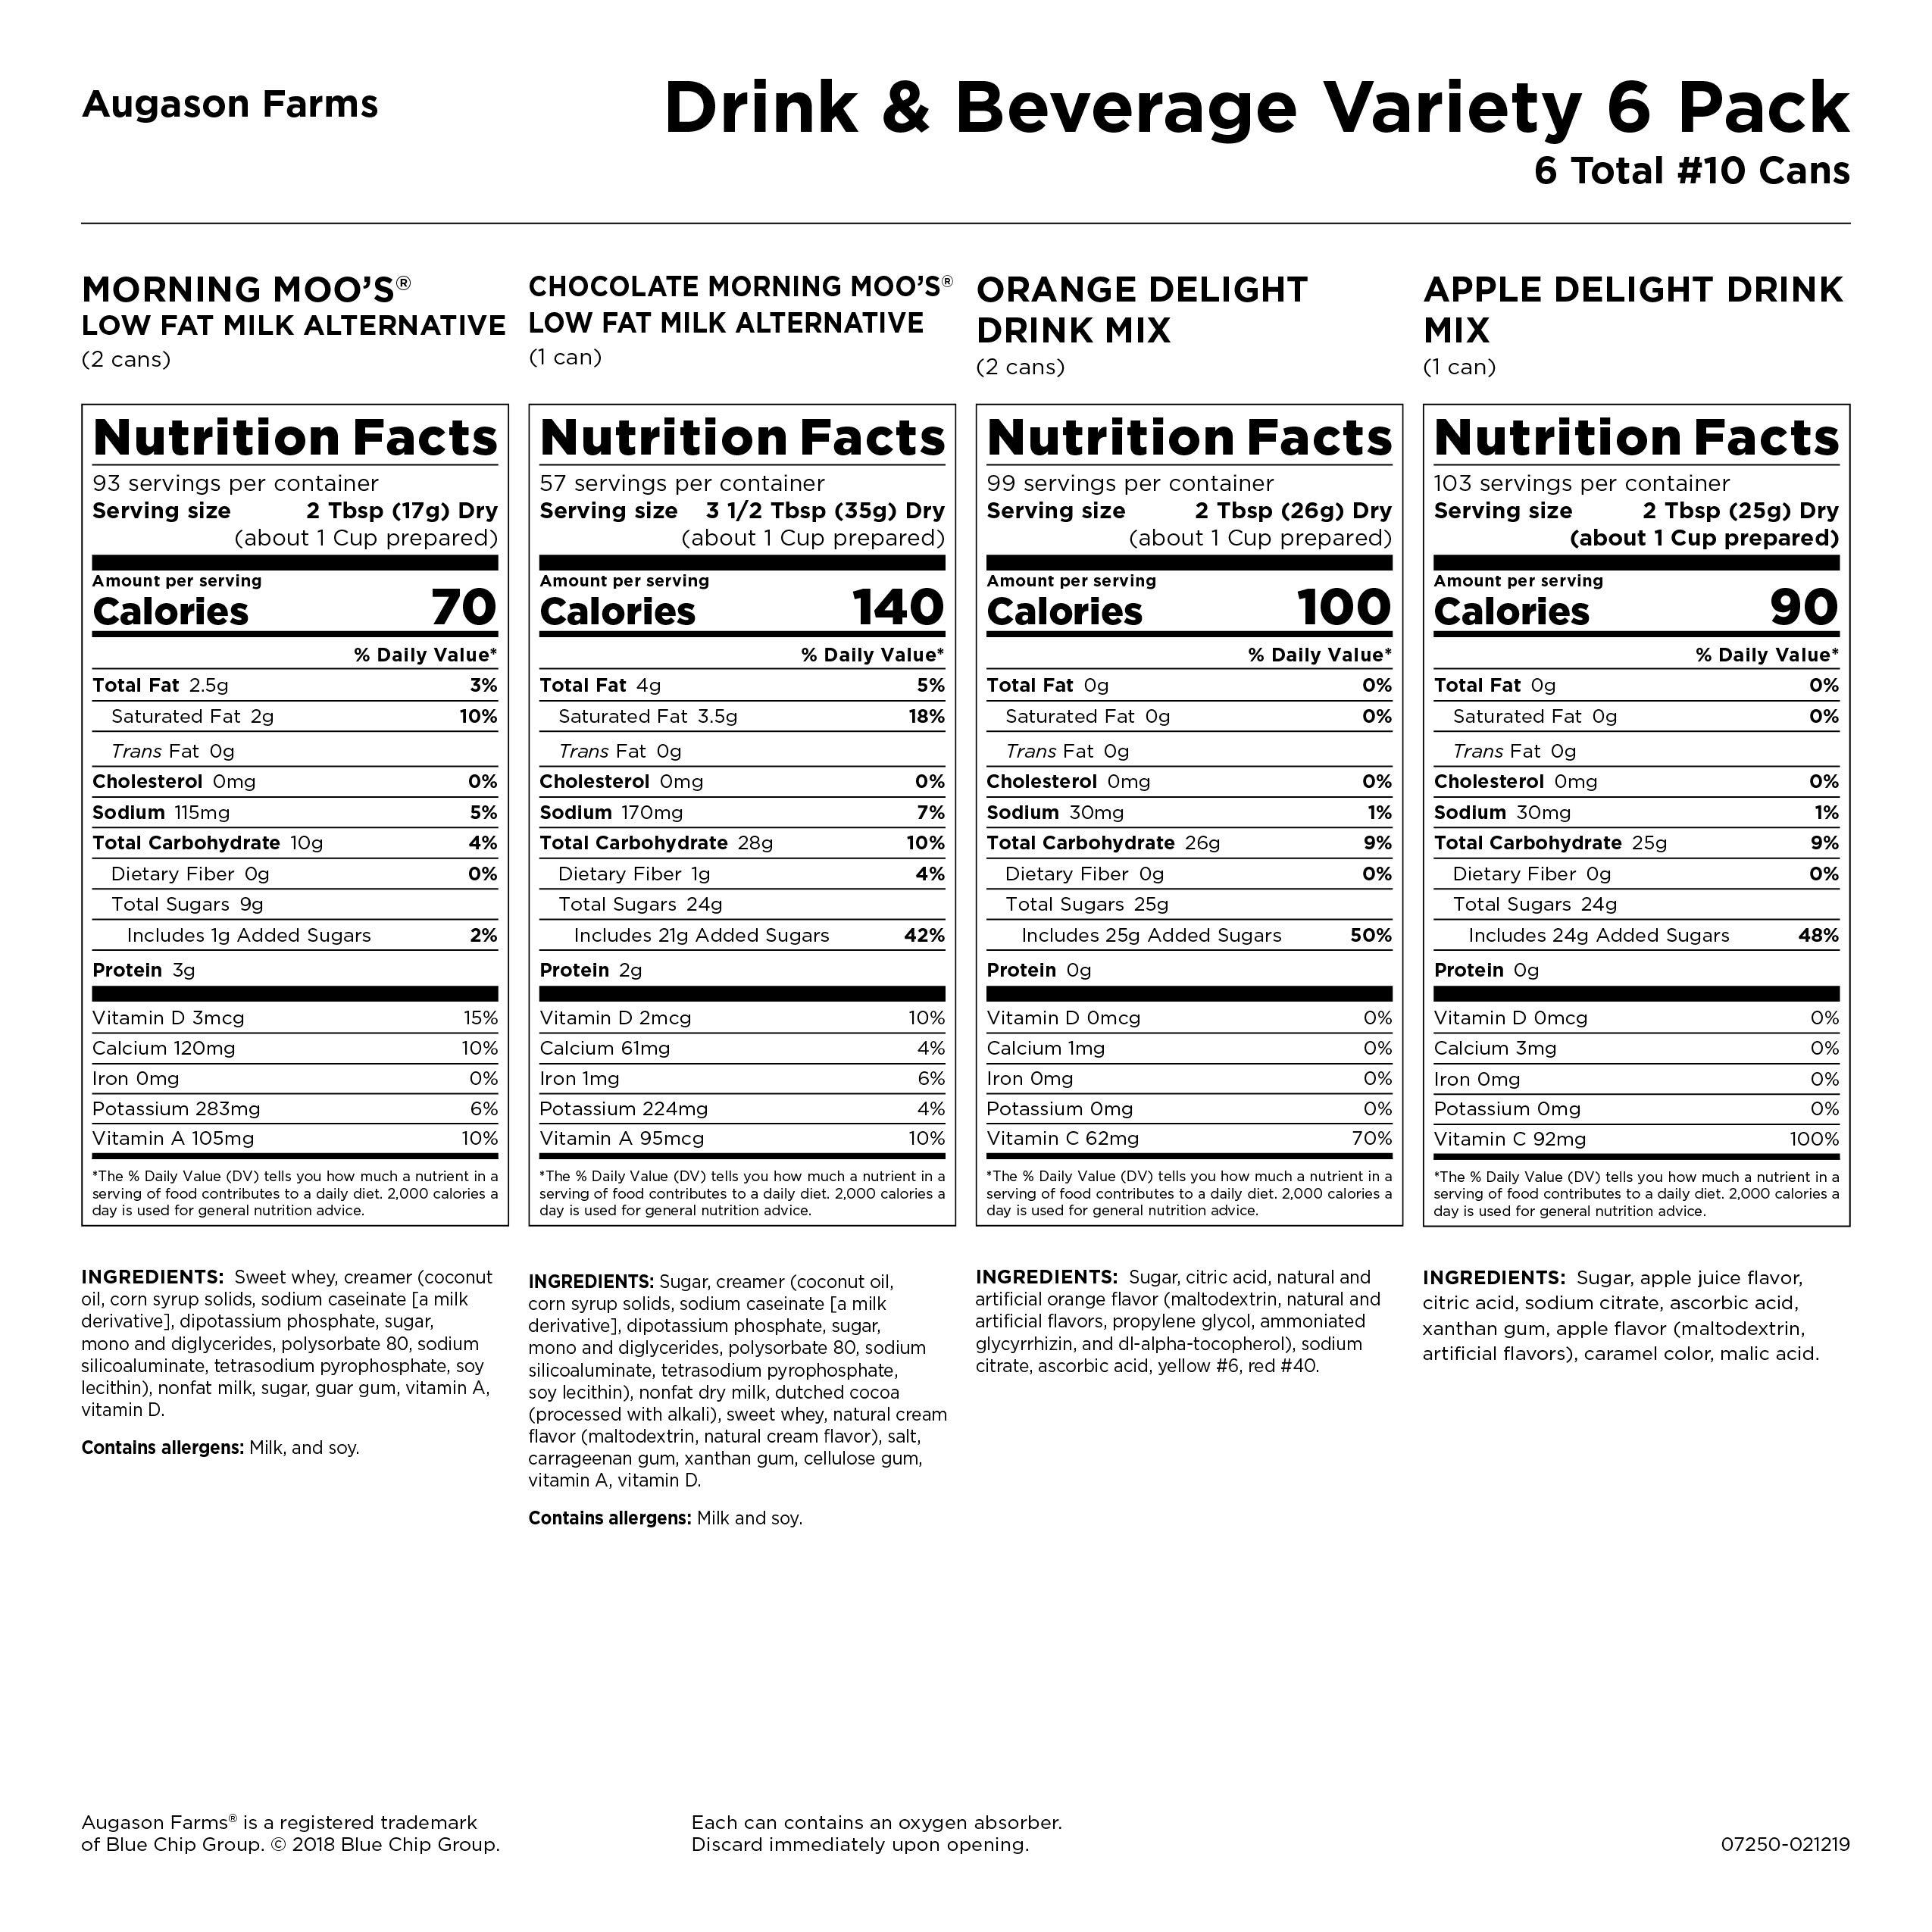 Augason Farms Emergency Drink & Beverage Variety Pack Kit by Augason Farms (Image #4)